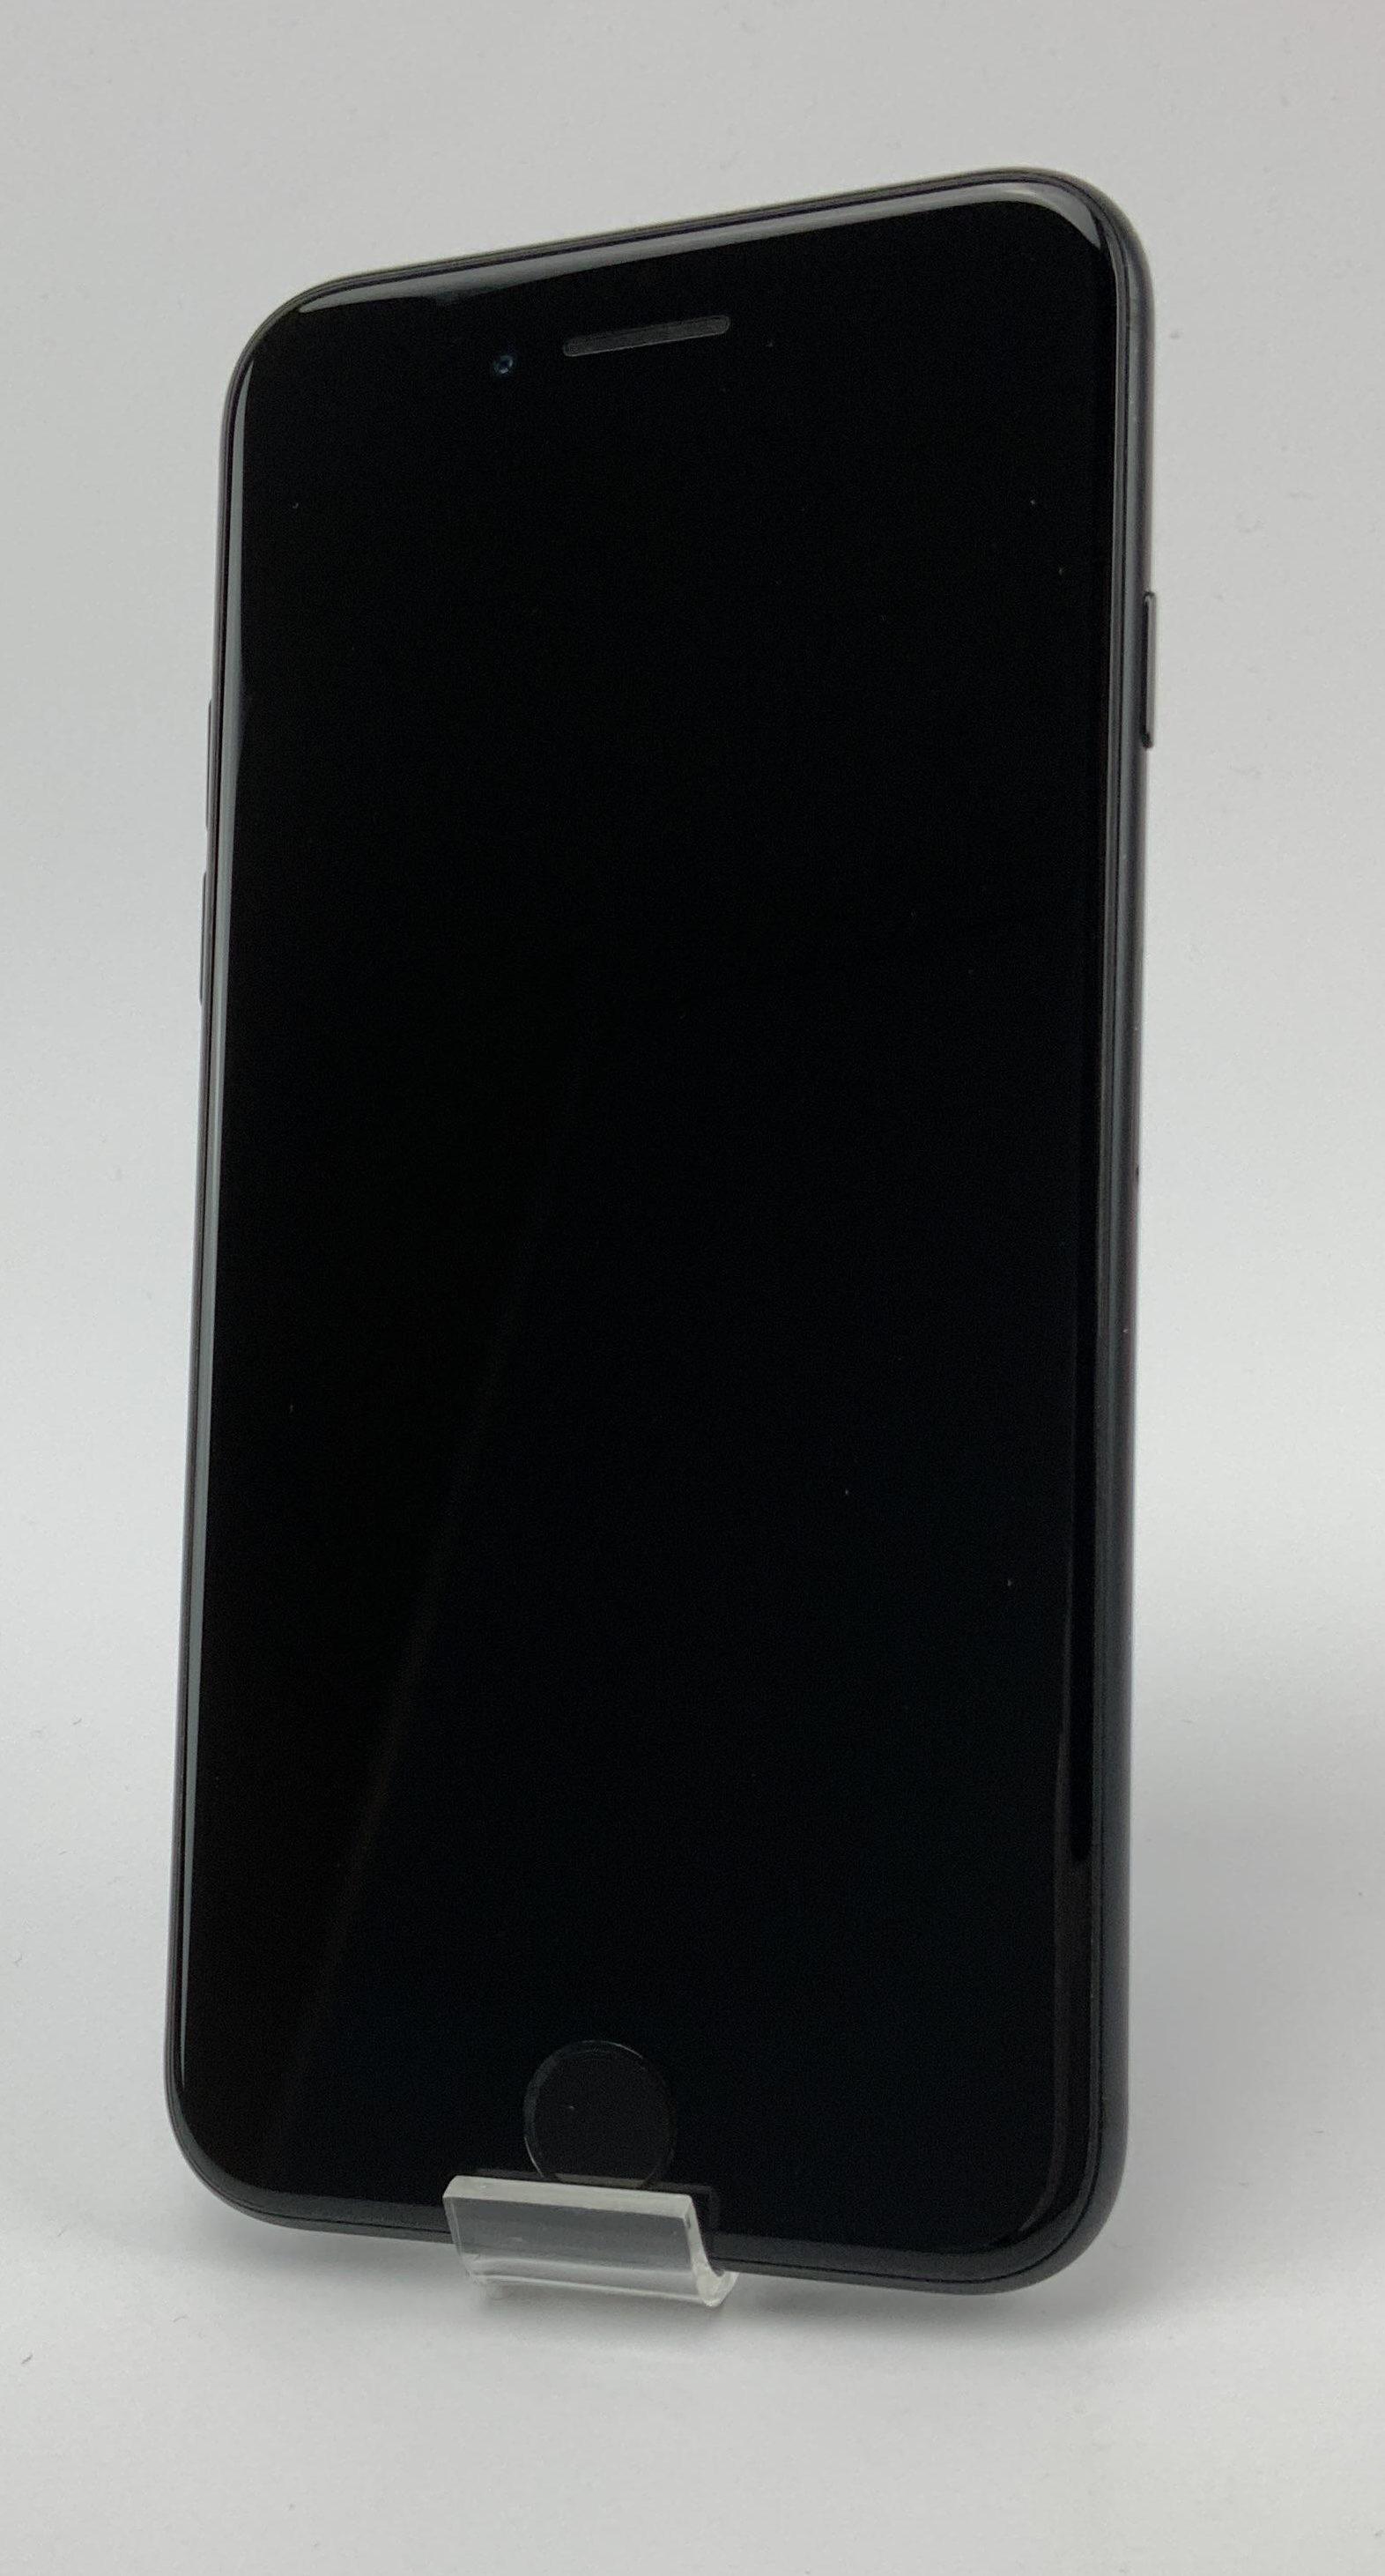 iPhone SE (2nd Gen) 64GB, 64GB, Black, imagen 1